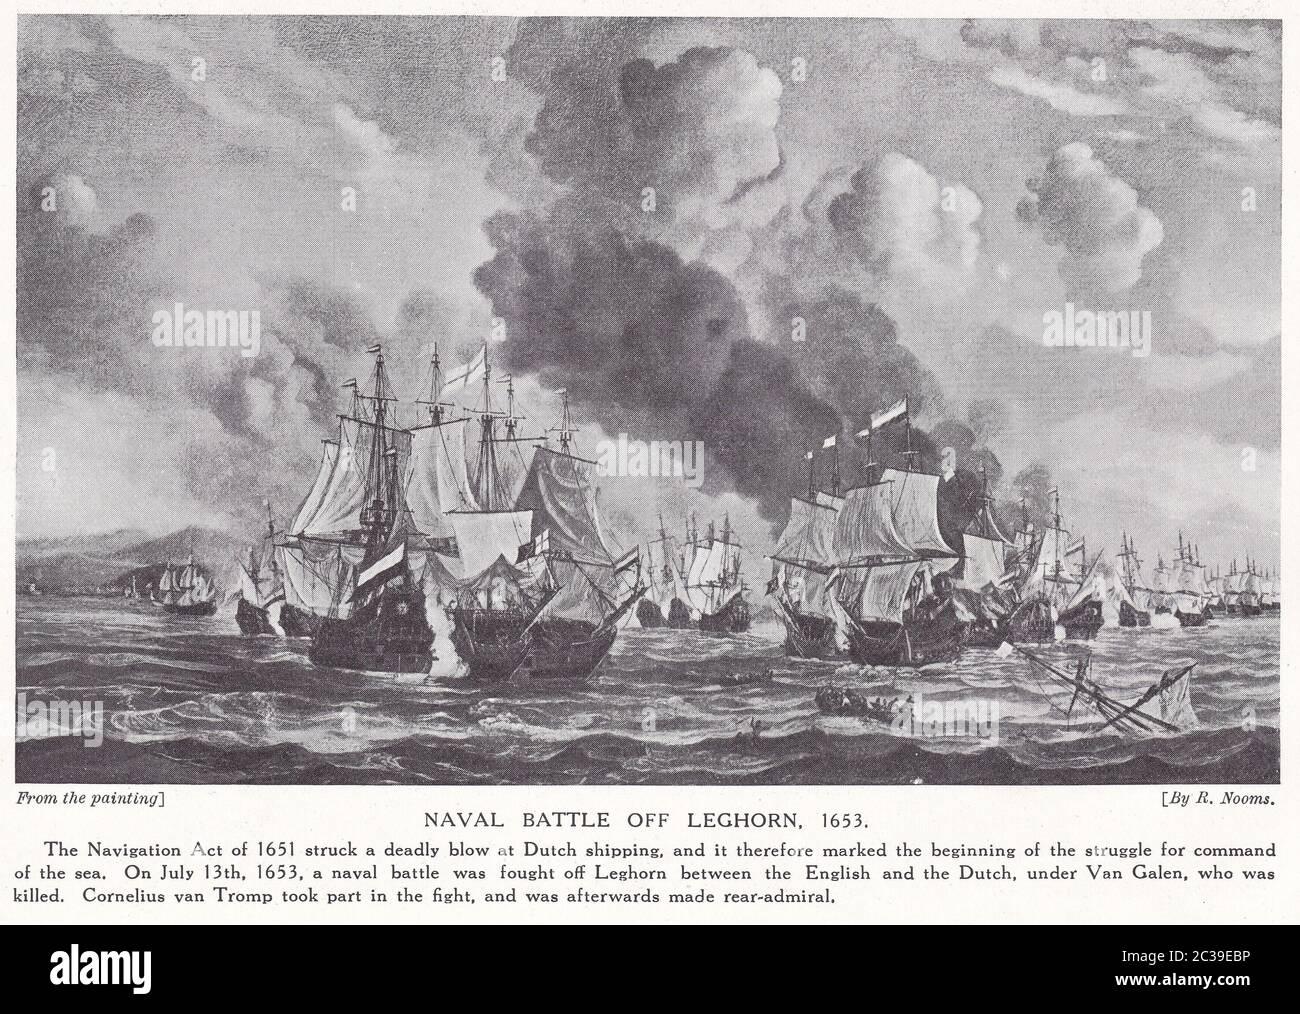 Batalla Naval de Leghorn, 1653 - pintura de R. Nooms. Foto de stock